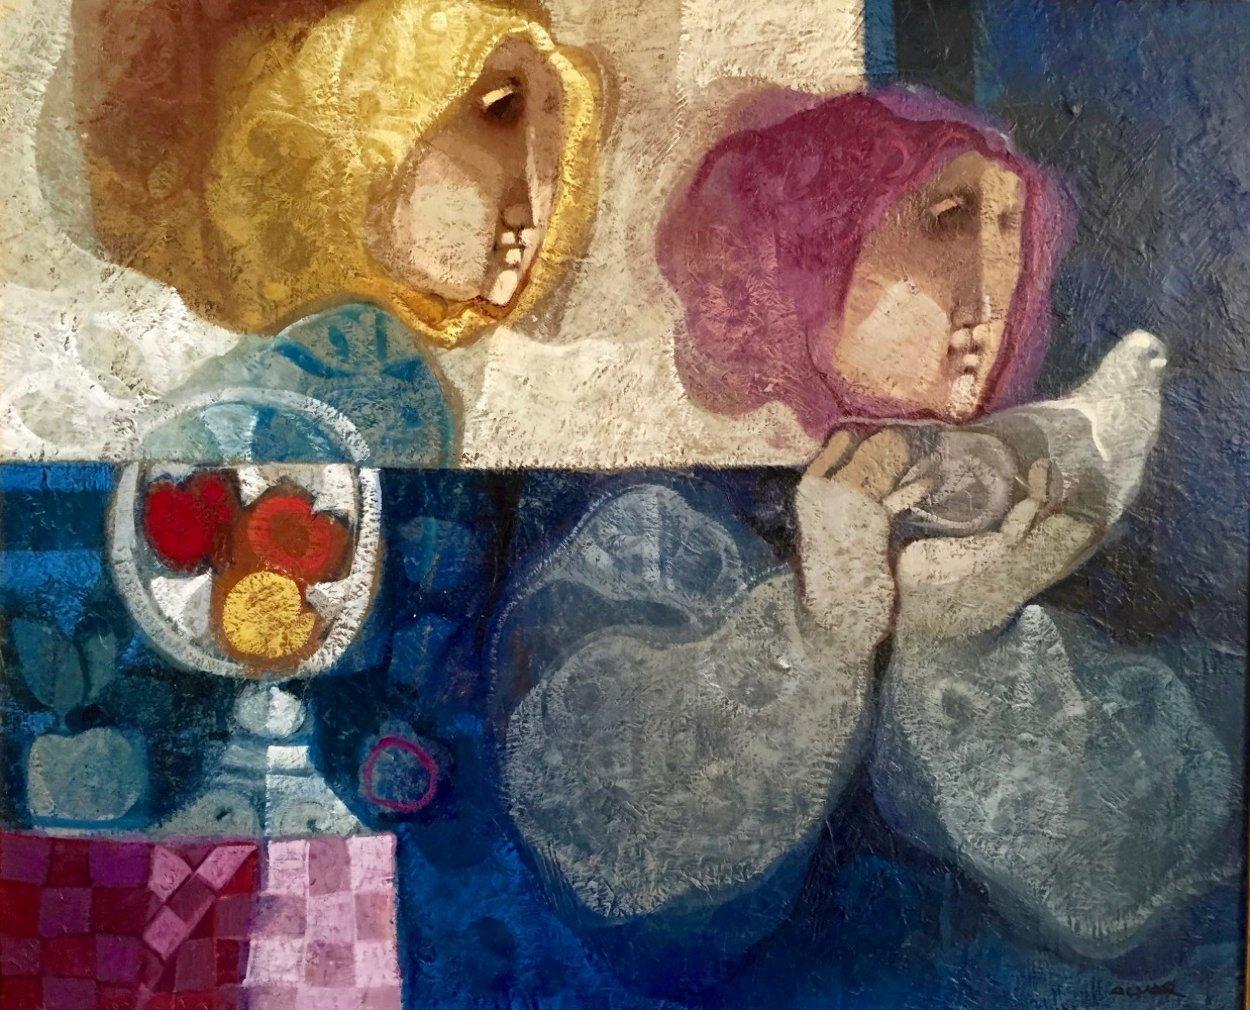 Comparturata Paloma oil on canvas 33x38 Original Painting by Sunol Alvar